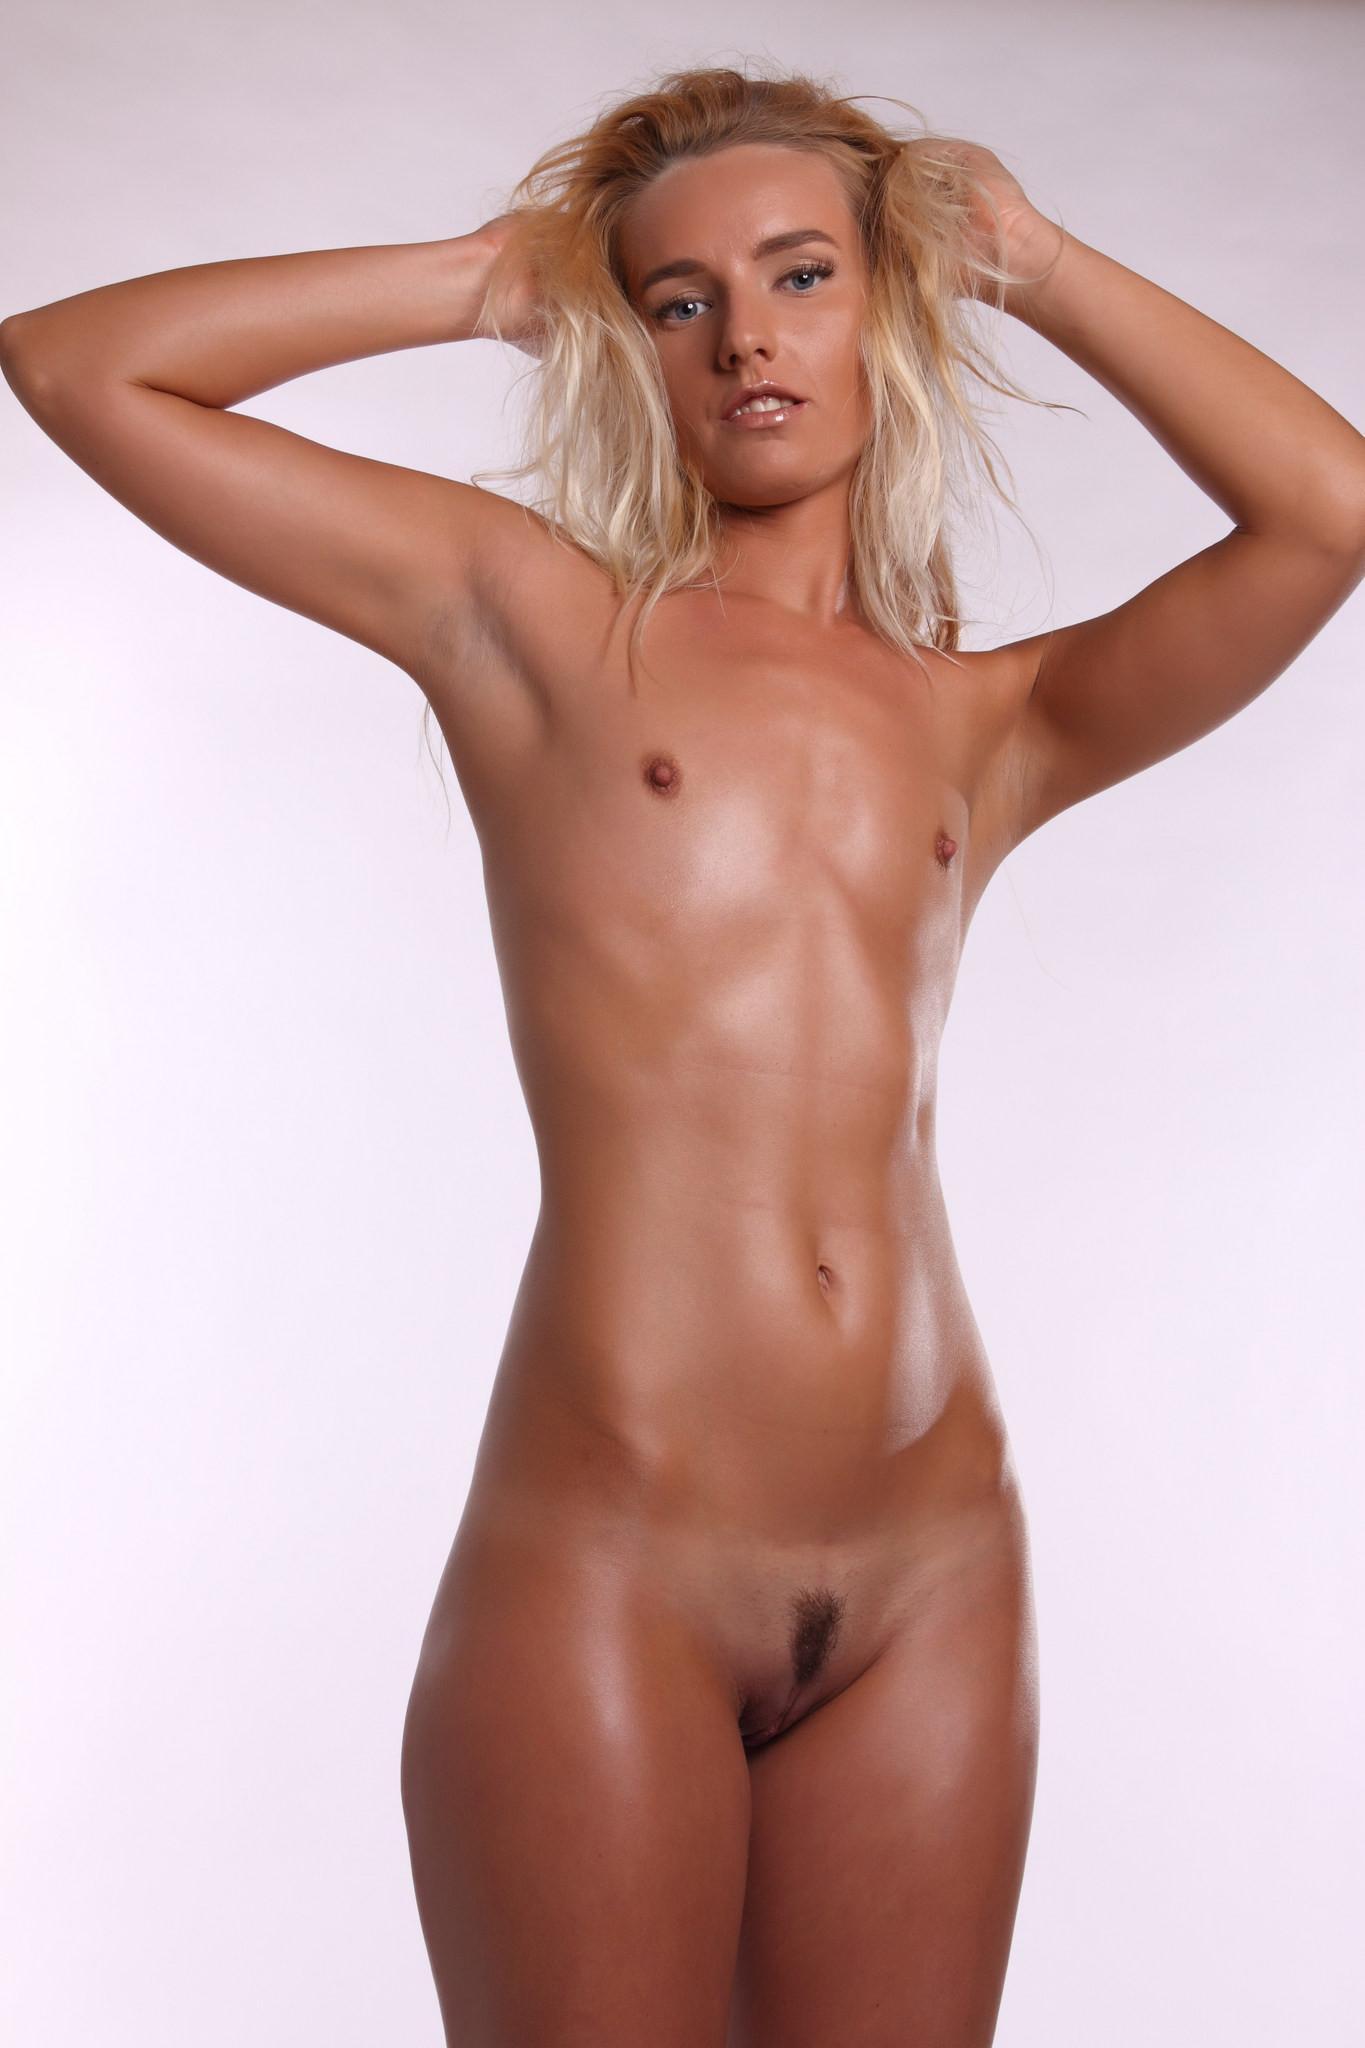 Small tits woman